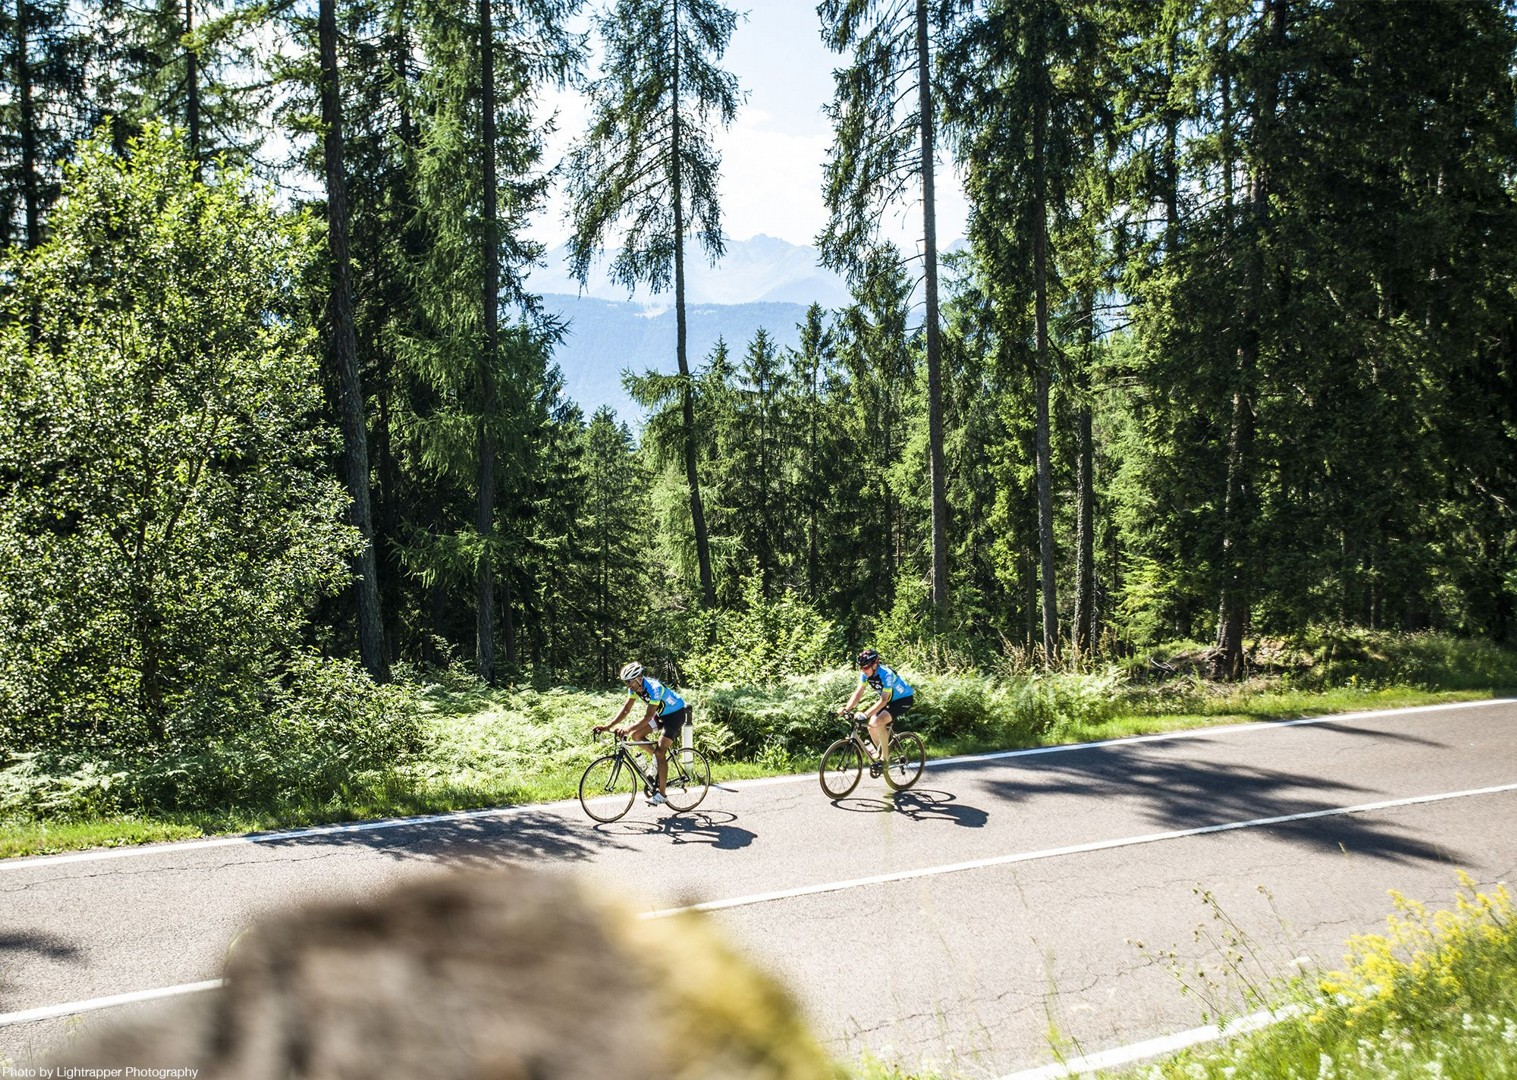 guided-road-cycling-holiday-croatia-and-slovenia-tour.jpg - Slovenia & Croatia - Julian Alps & Istria - Guided Road Cycling Holiday - Road Cycling